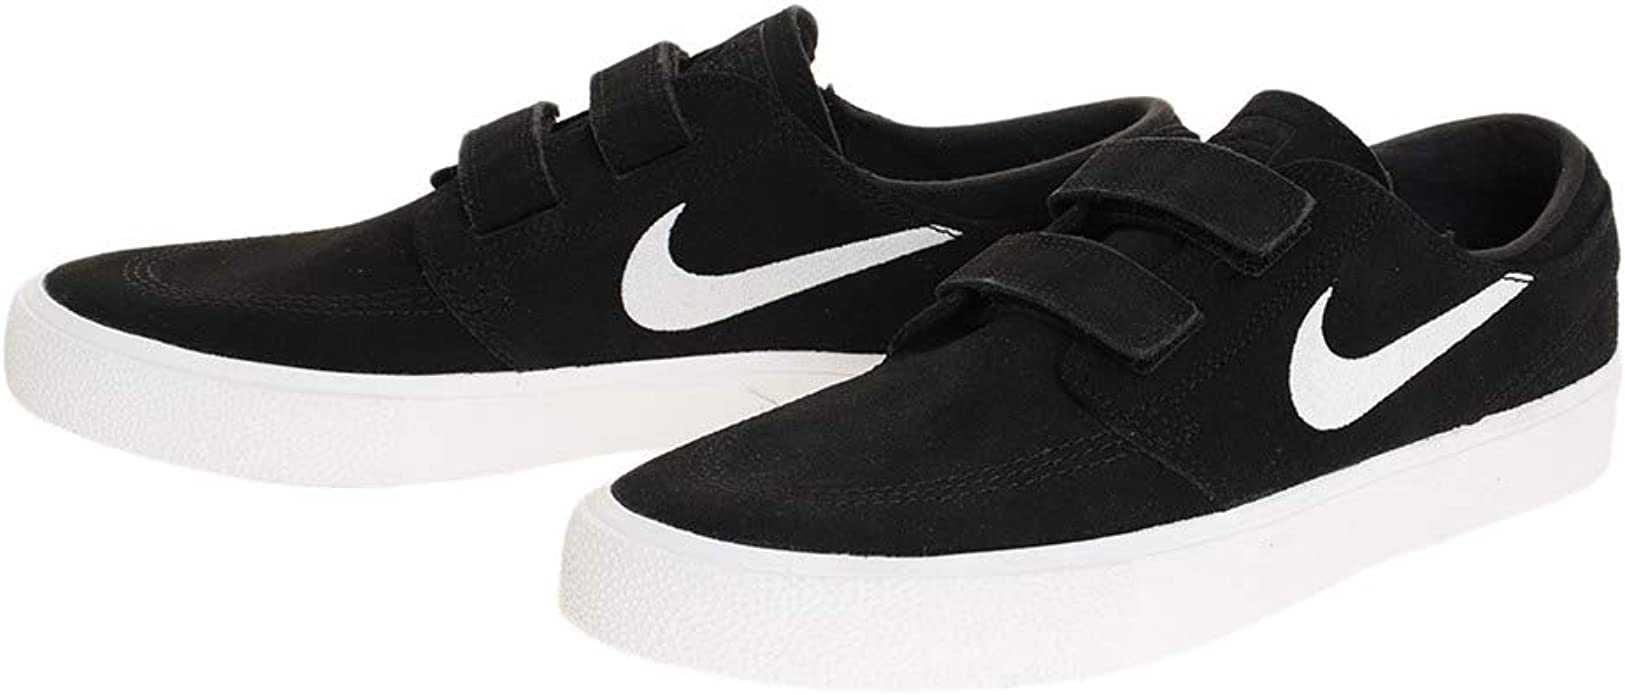 Prisión tortura Tumor maligno  Amazon.com: Nike SB Zoom Stefan Janoski AC RM Mens Skate Shoes (7.5, Black /White-Black): Sports & Outdoors